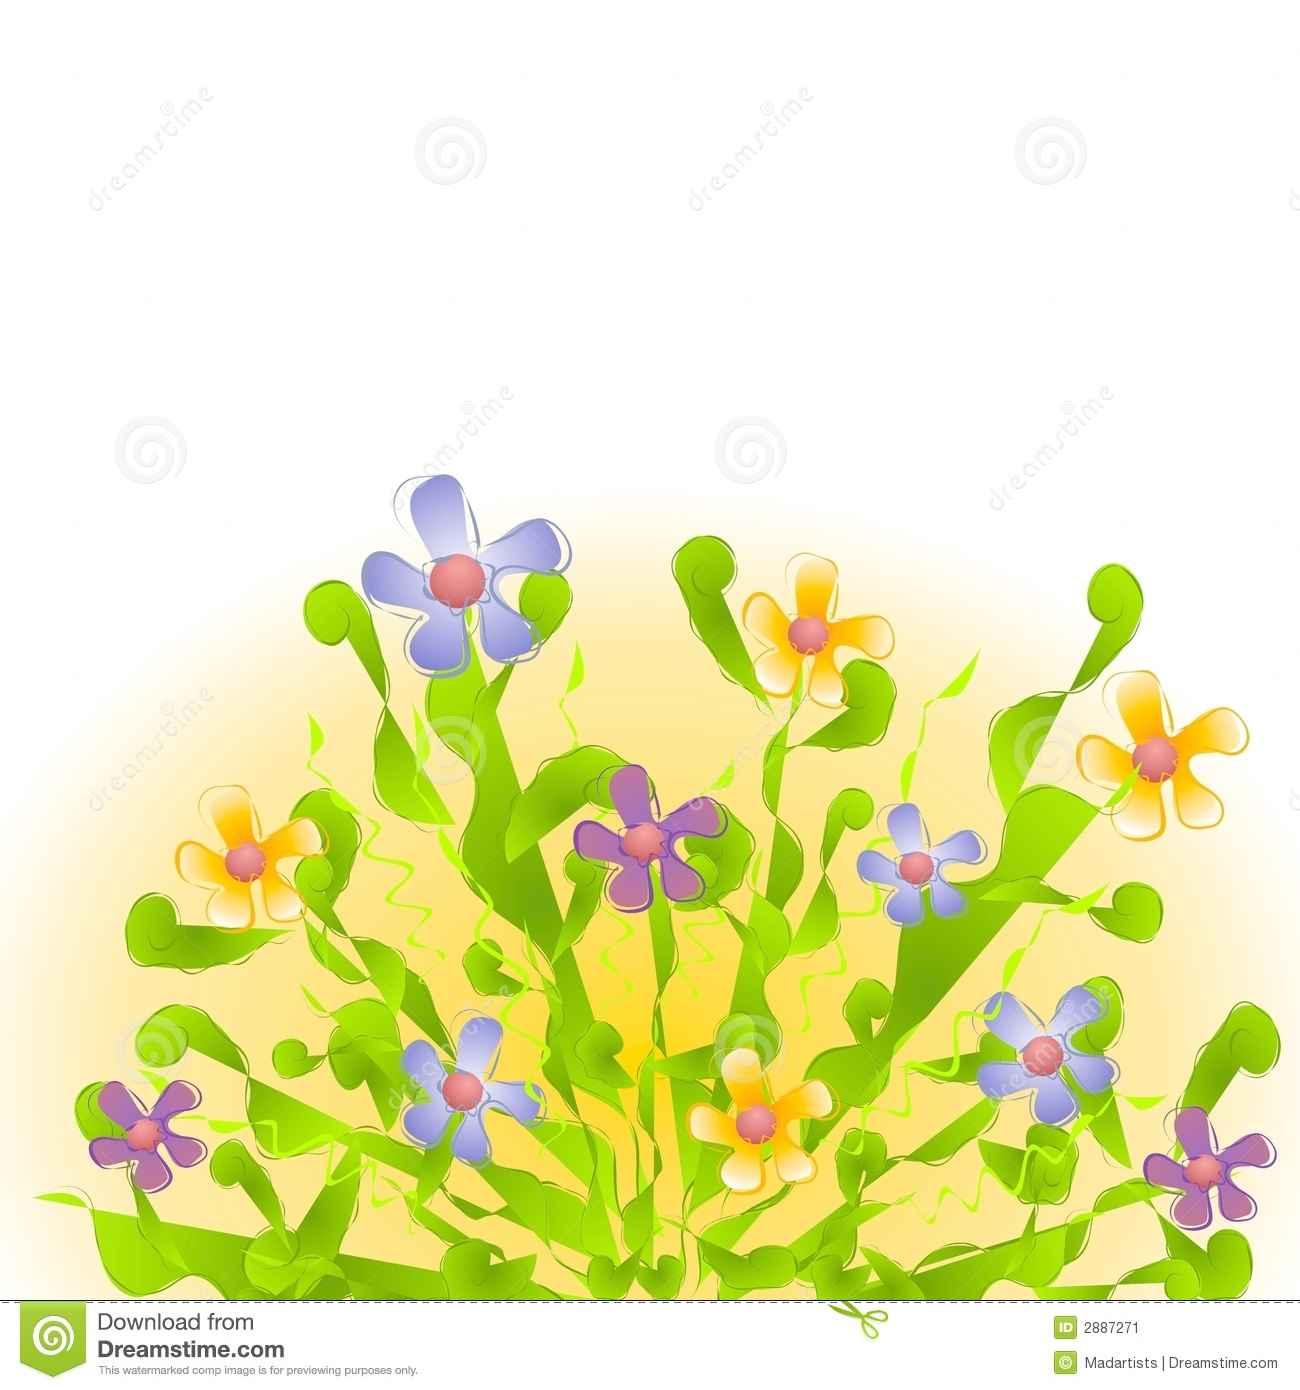 1300x1390 Clipart Images Of Garden